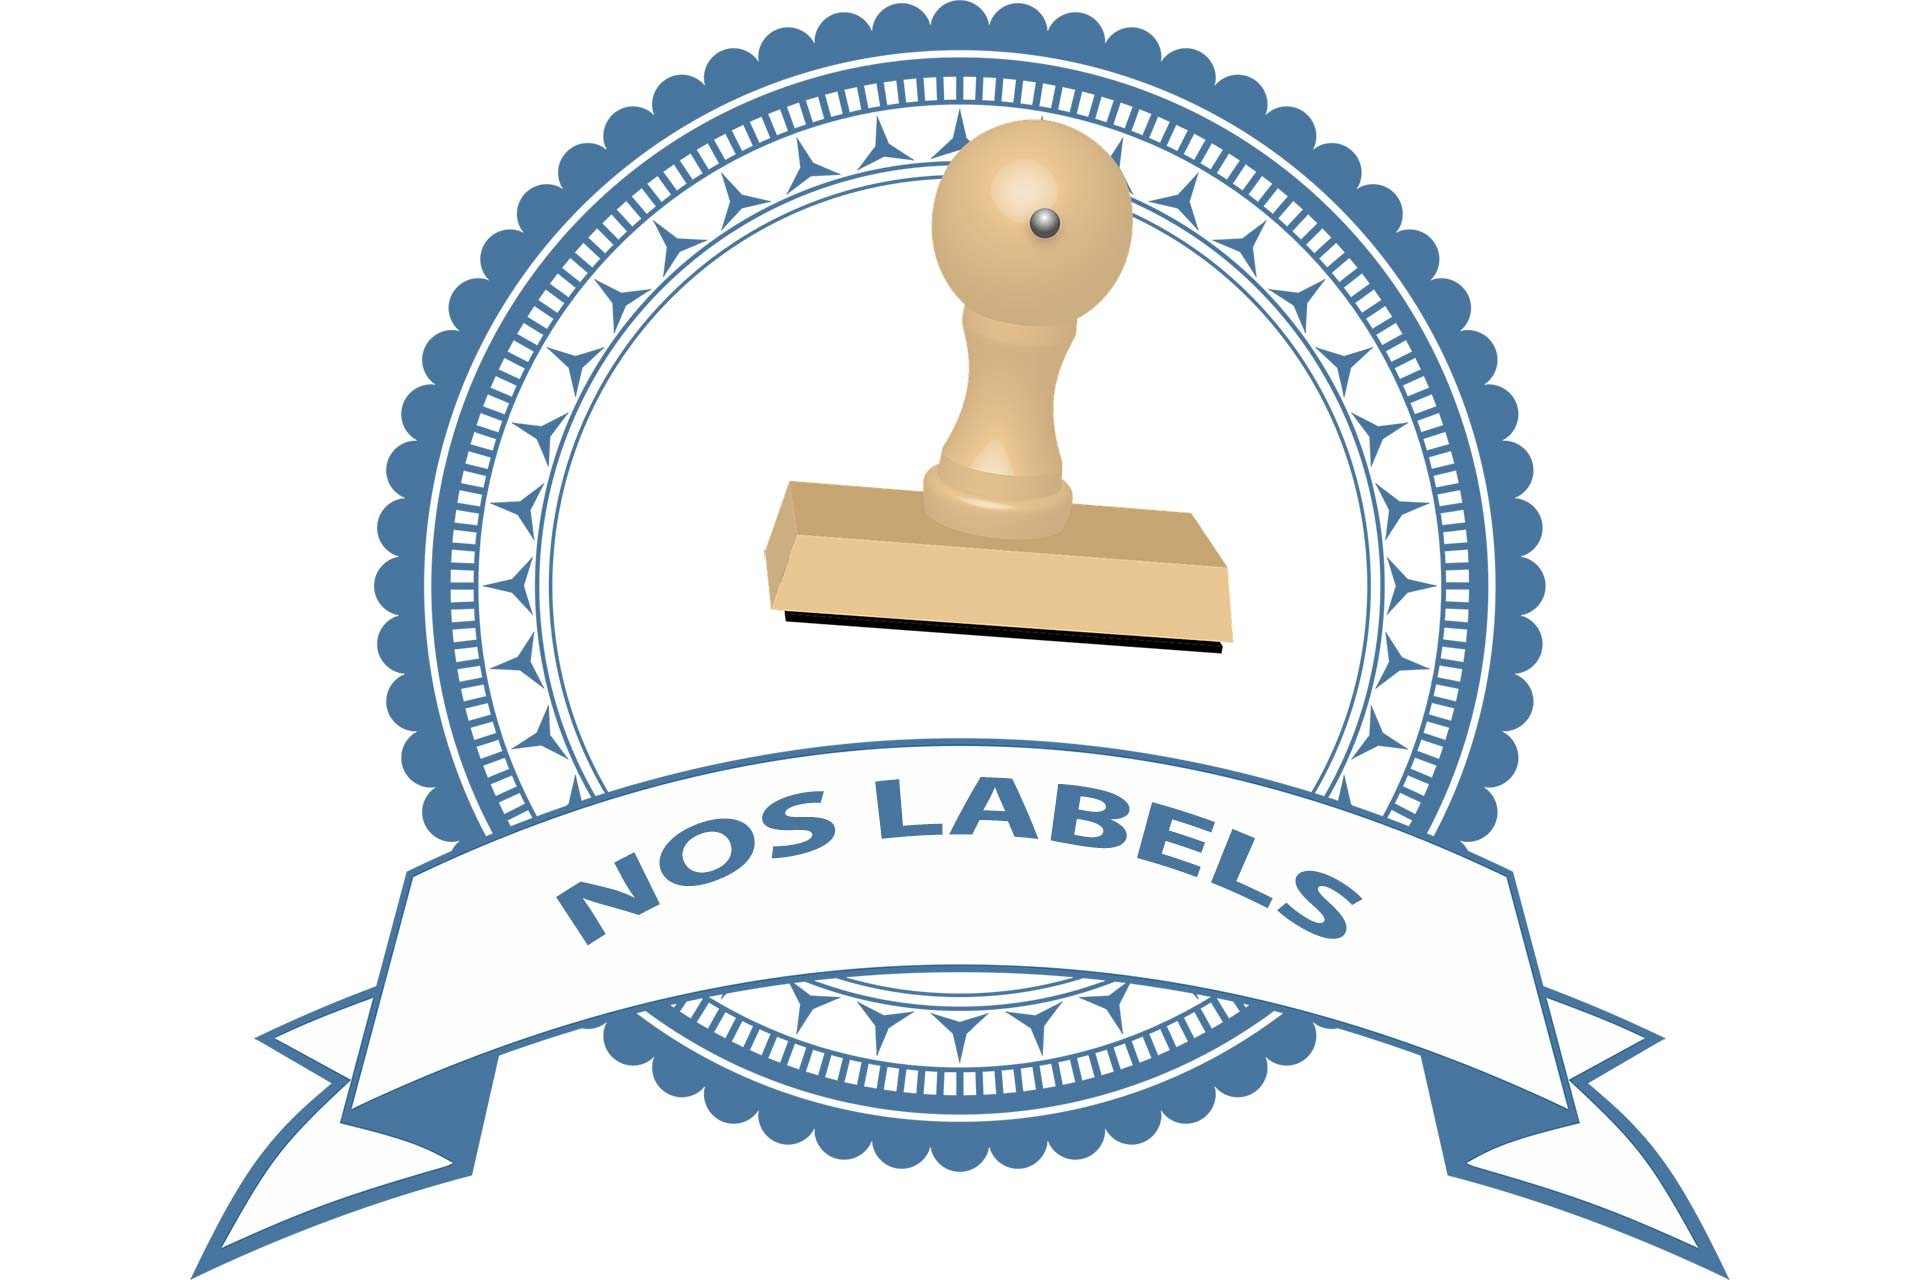 Nos labels